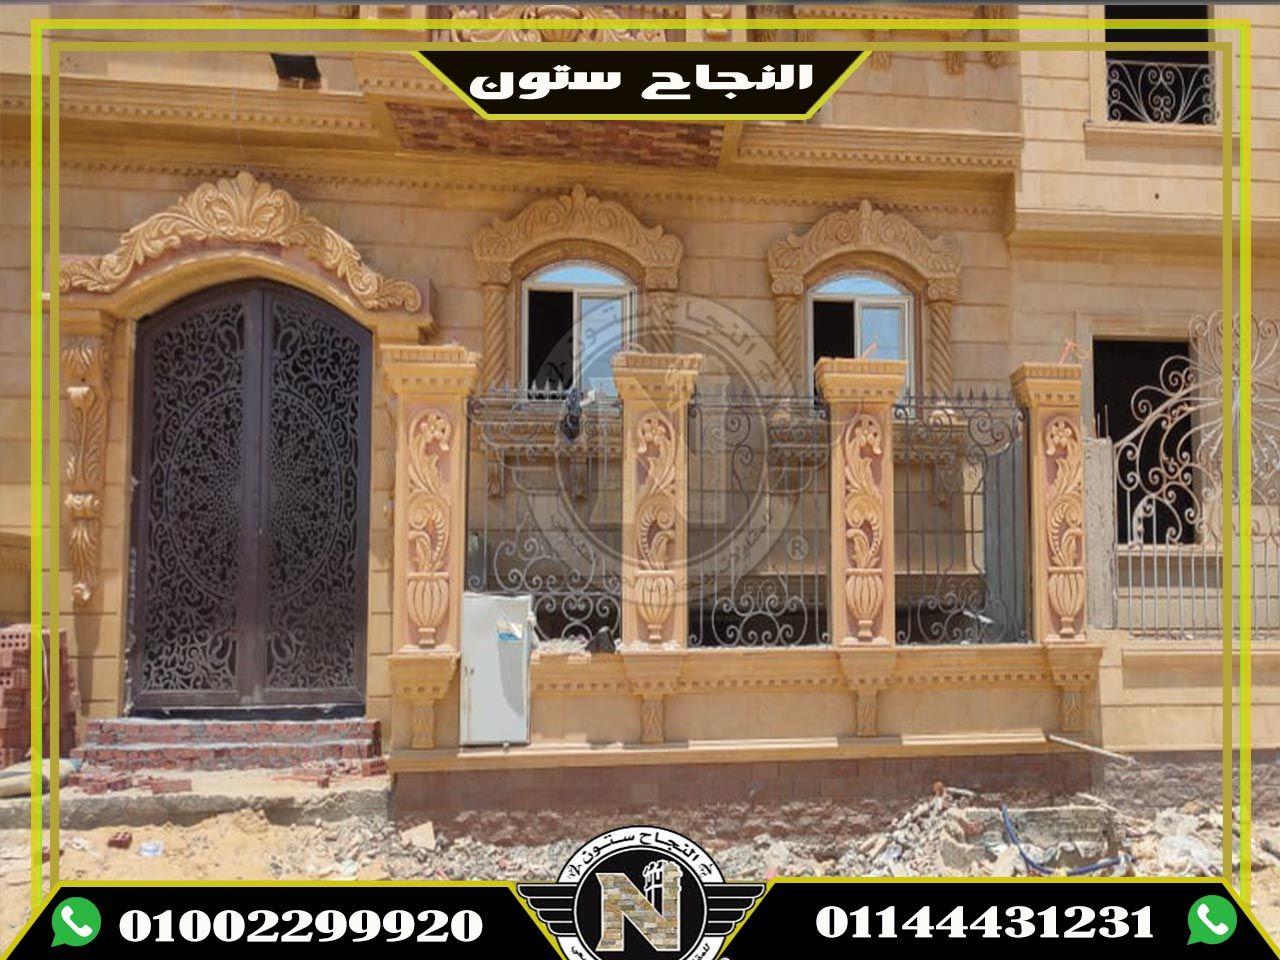 اسعار ديكورات الحجر الهاشمي فى مصر اسوار ومداخل بوابات الحجر الهاشمي فى مصر House Styles Mansions Home Decor